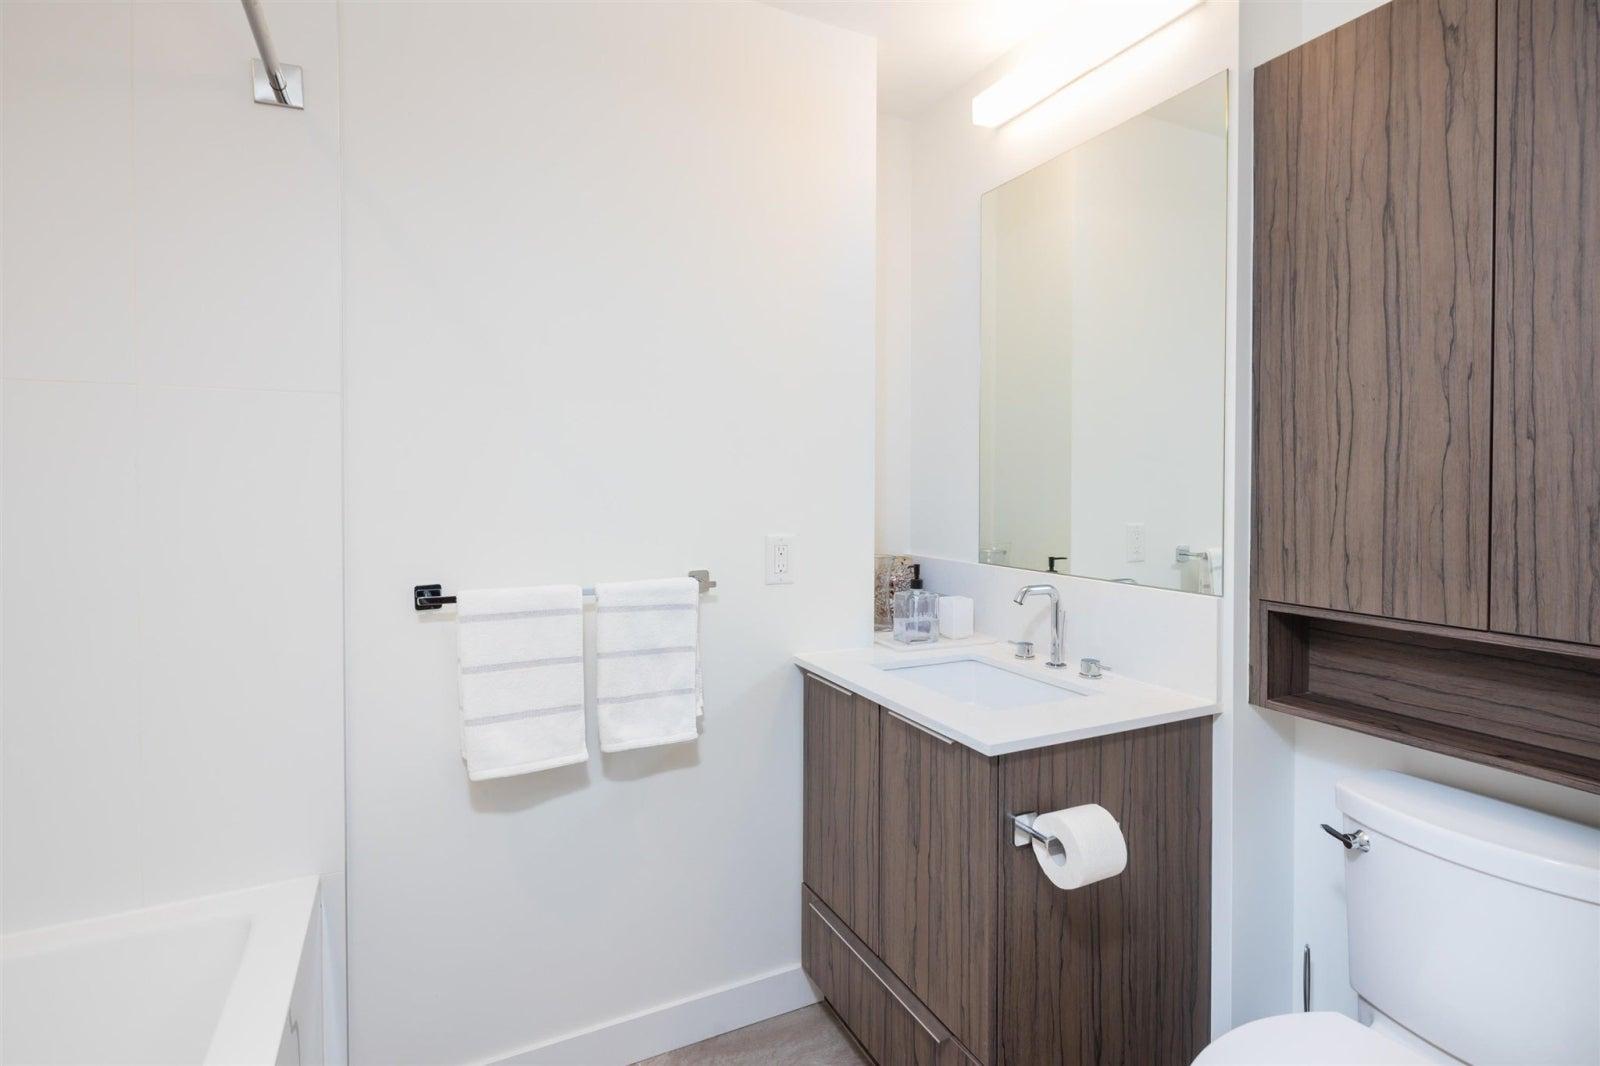 408 379 E BROADWAY AVENUE - Mount Pleasant VE Apartment/Condo for sale, 2 Bedrooms (R2599900) #15